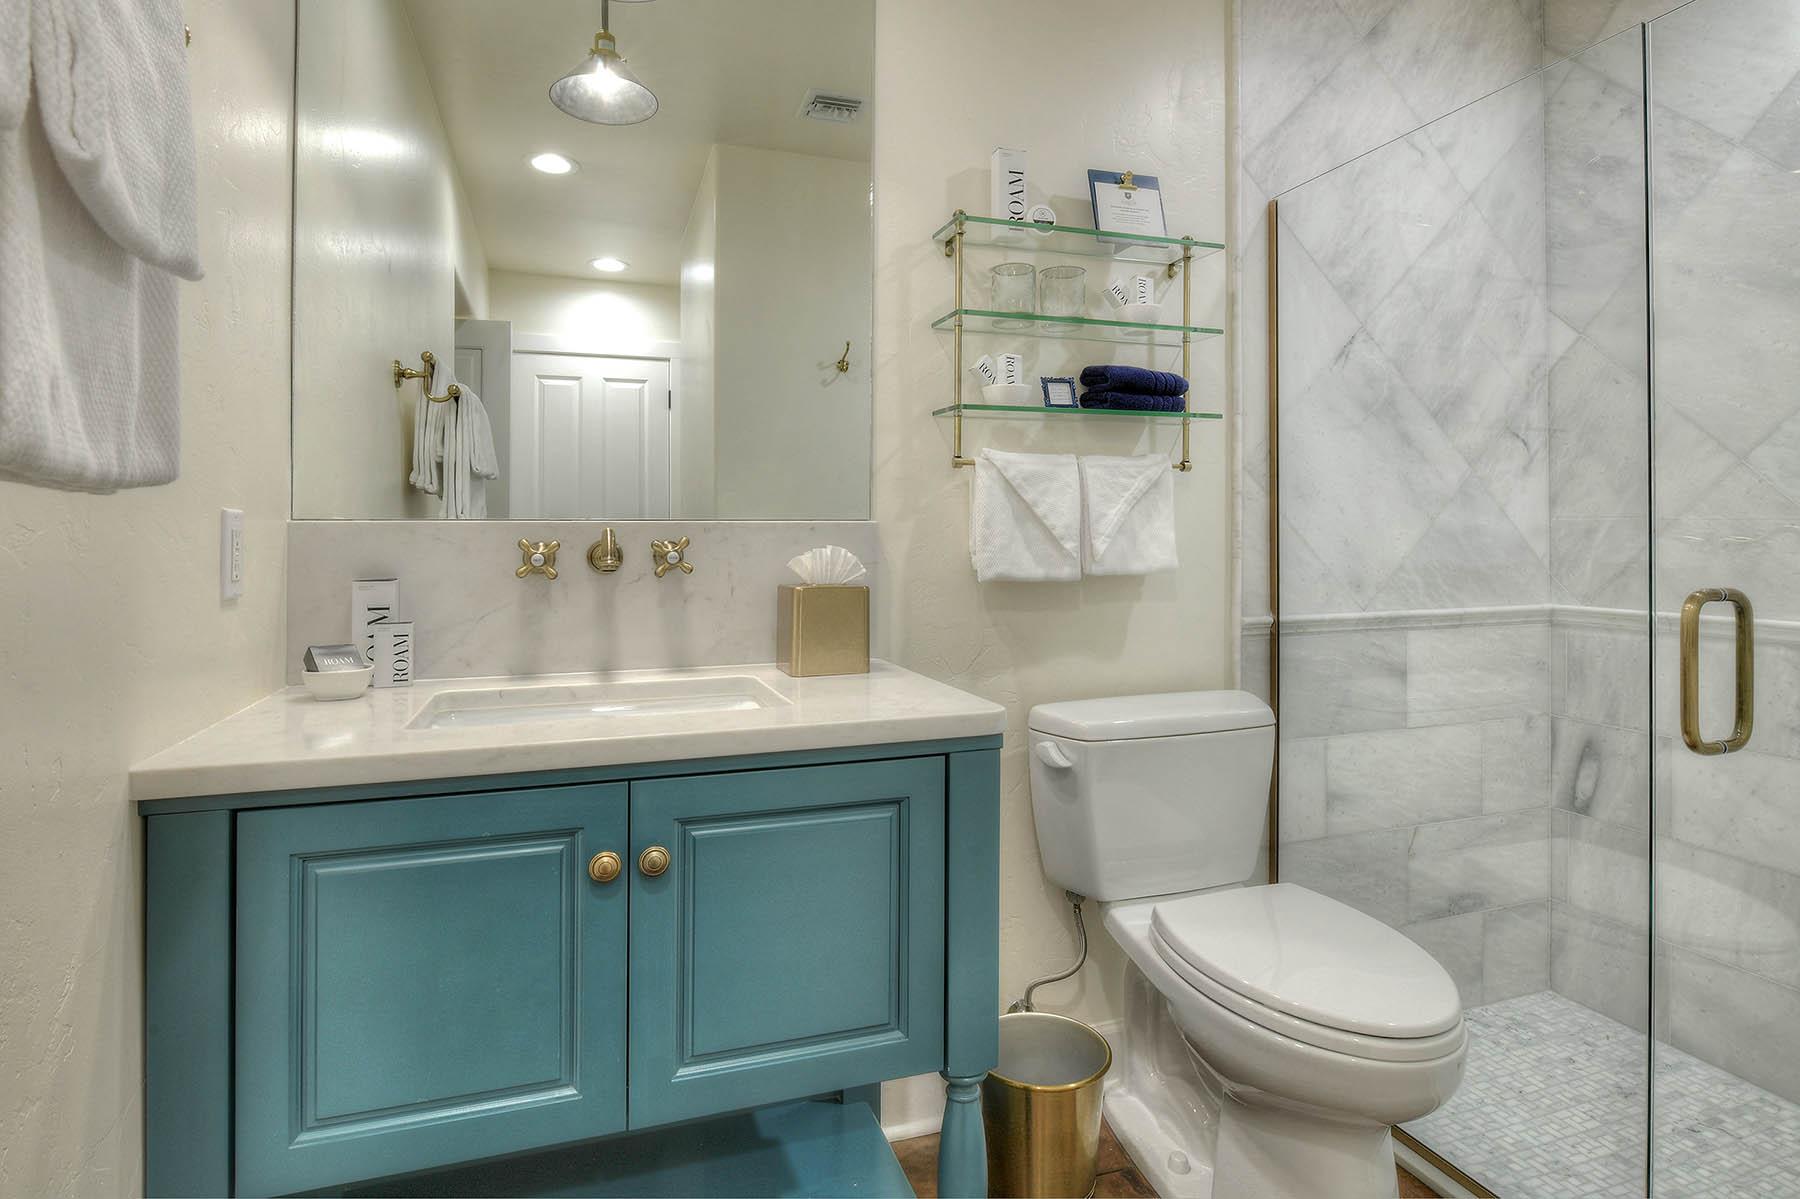 Poston Bathroom